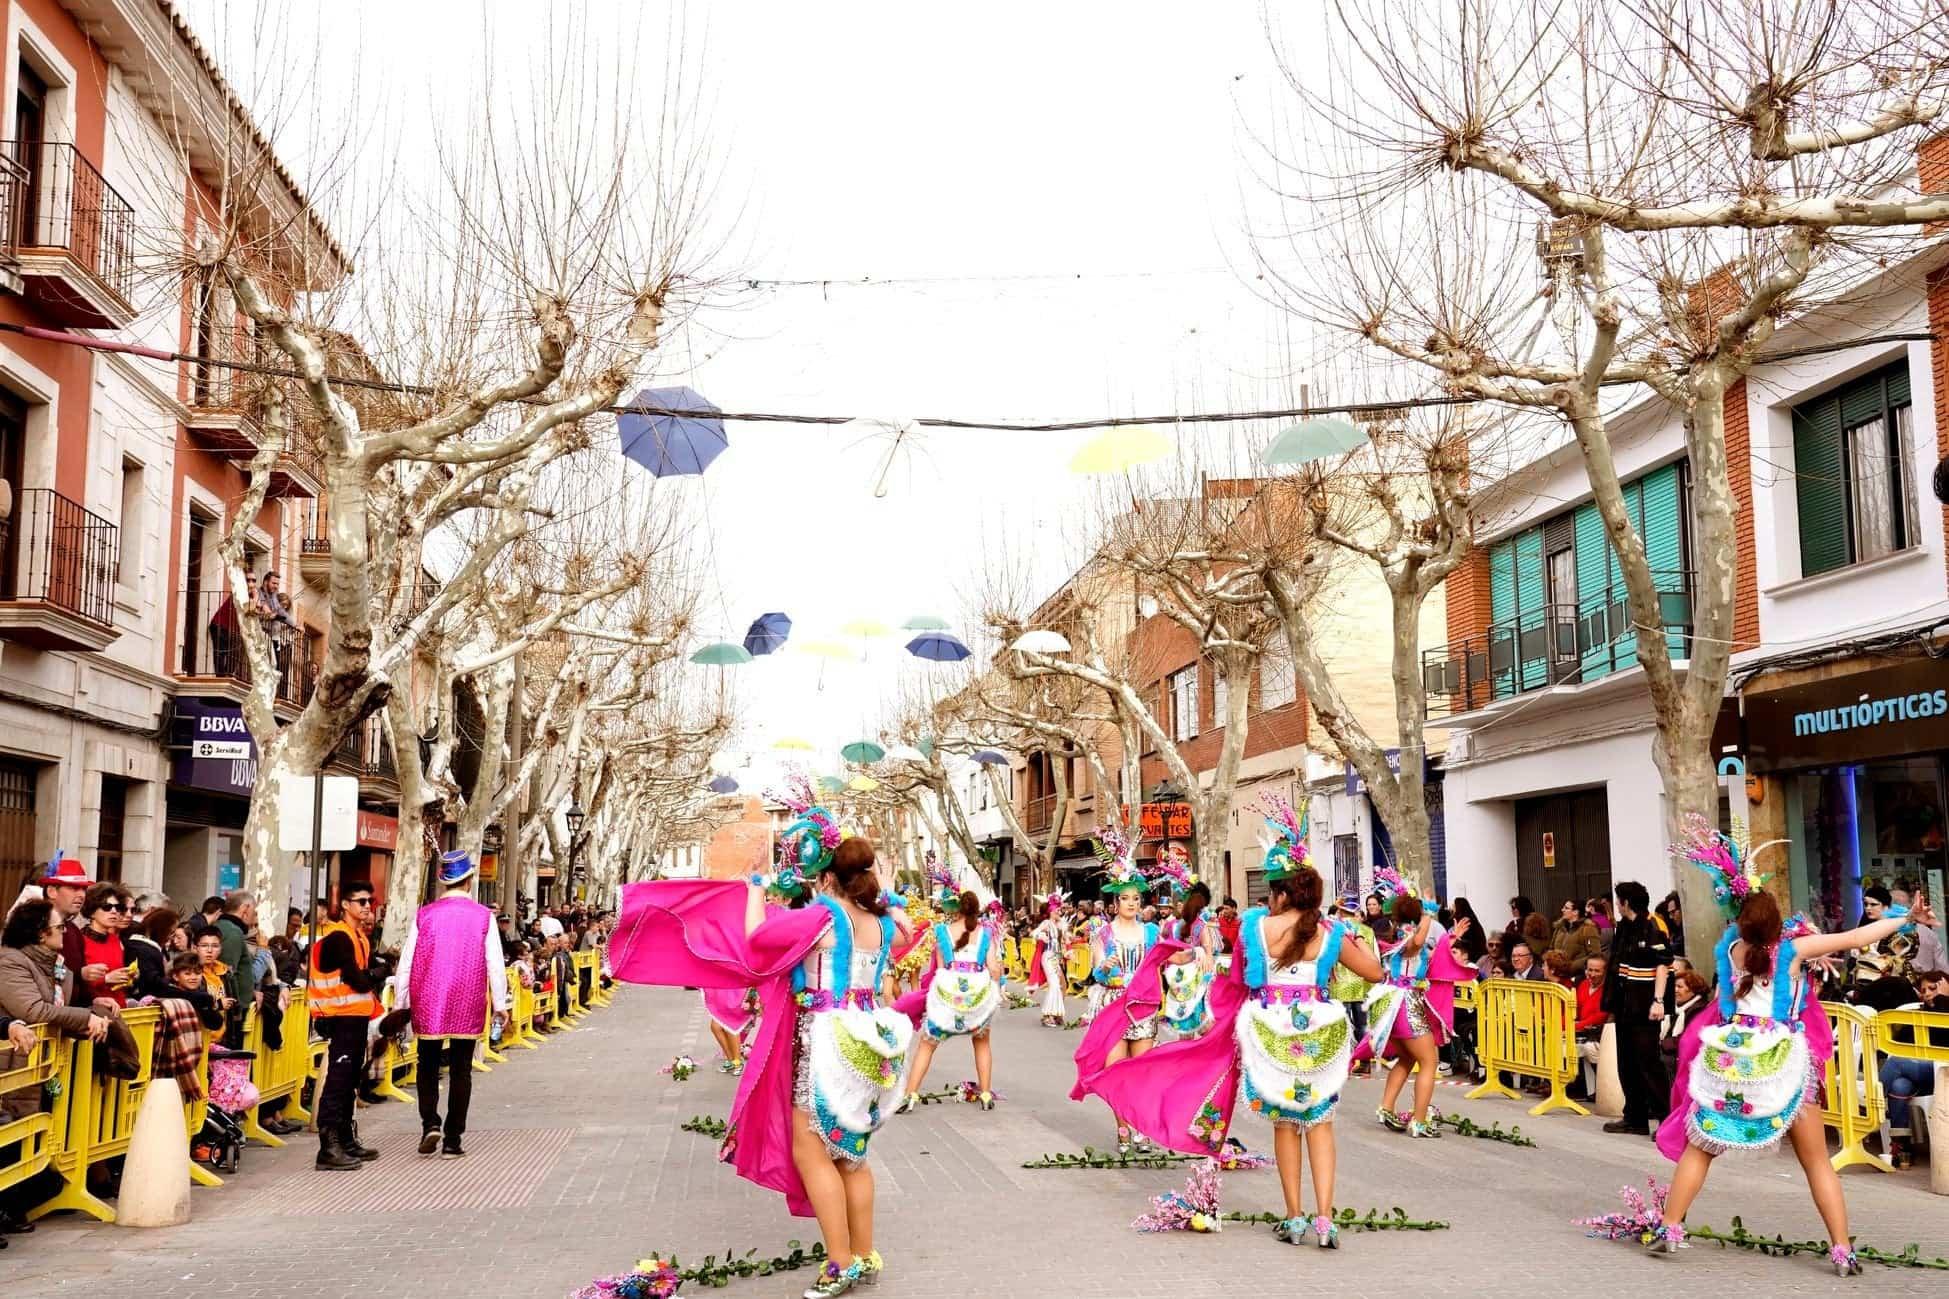 Carnaval de herencia 2020 ofertorio 174 - Selección de fotografías del Ofertorio del Carnaval de Herencia